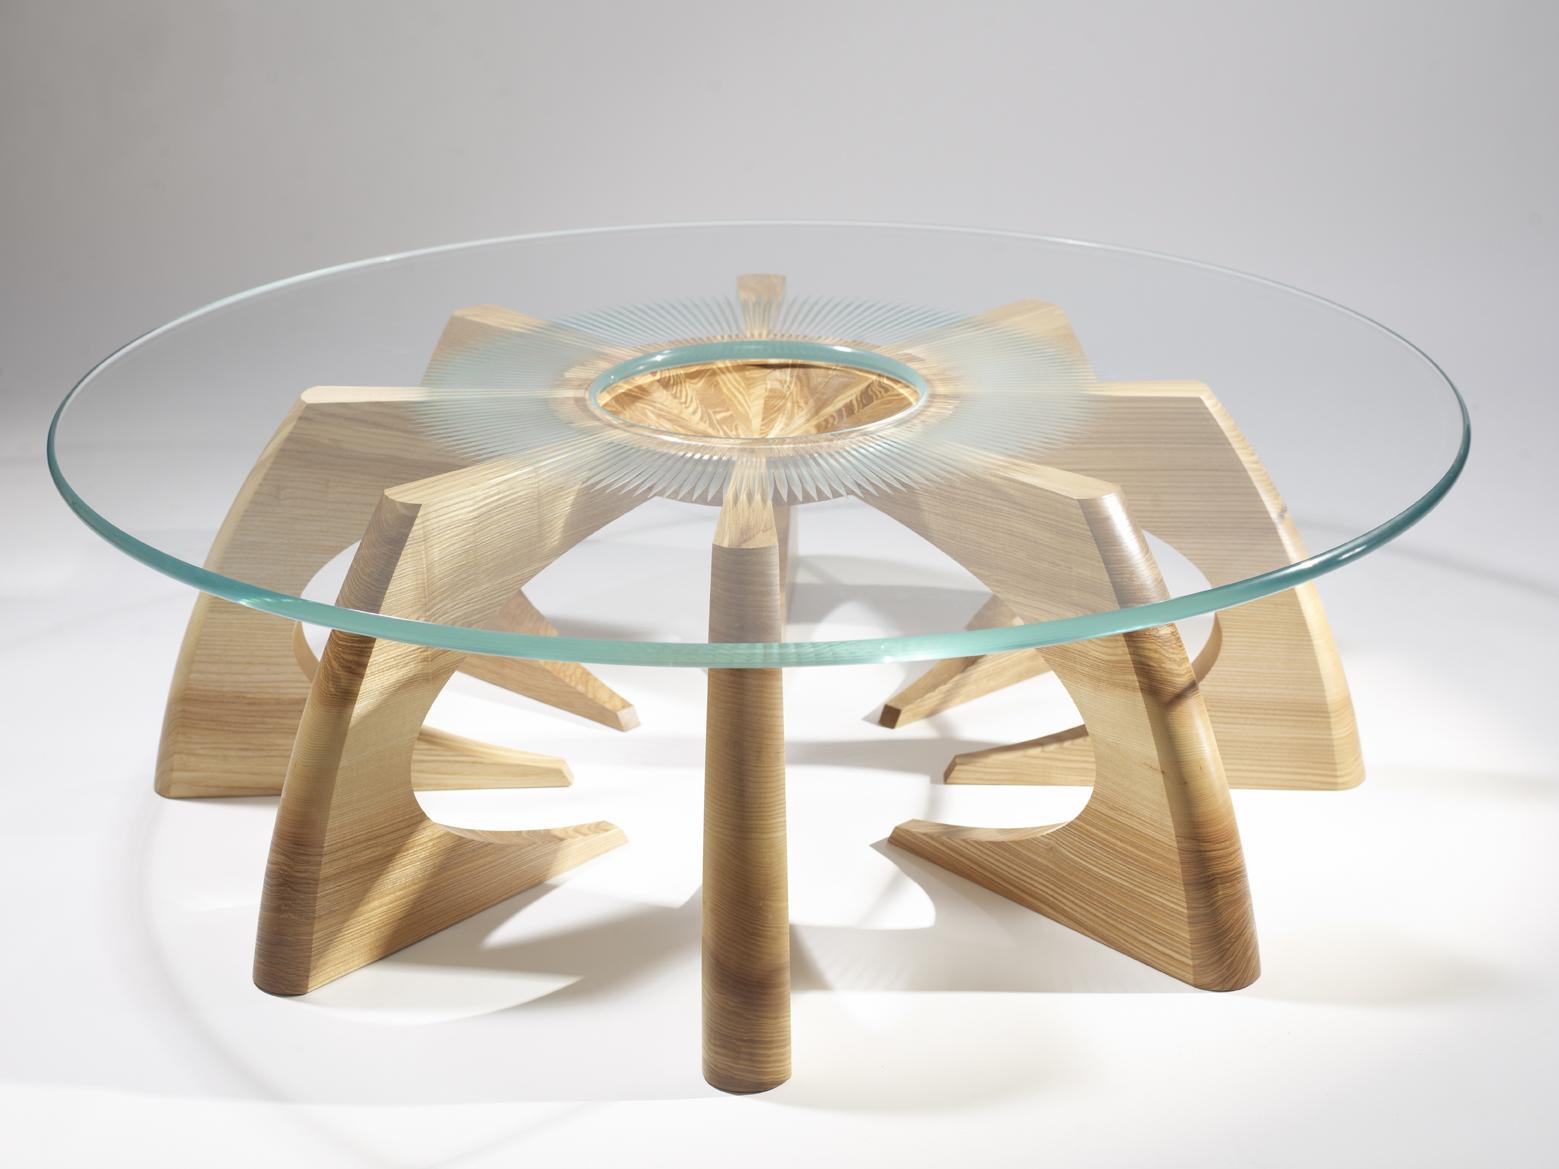 Chair Design Ideas Swivel On Wheels Interior House A Minimalist Table But Can Produce